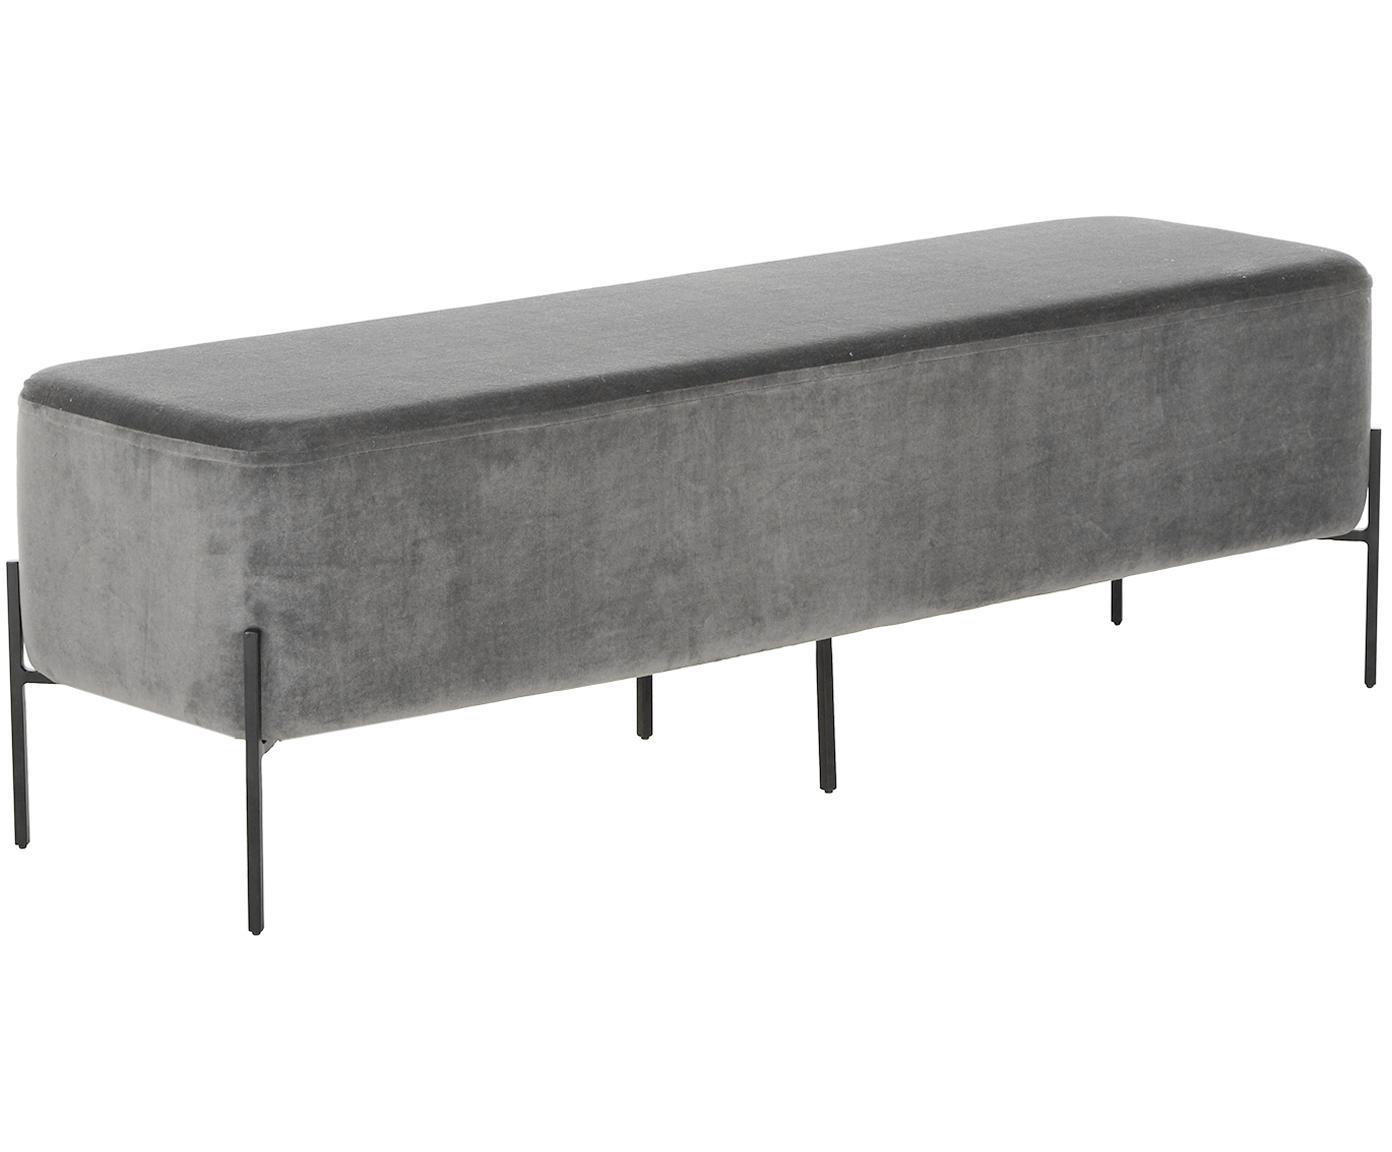 Samt-Polsterbank Harper, Bezug: Baumwollsamt, Fuß: Metall, pulverbeschichtet, Bezug: DunkelgrauFuß: Schwarz, matt, 140 x 45 cm